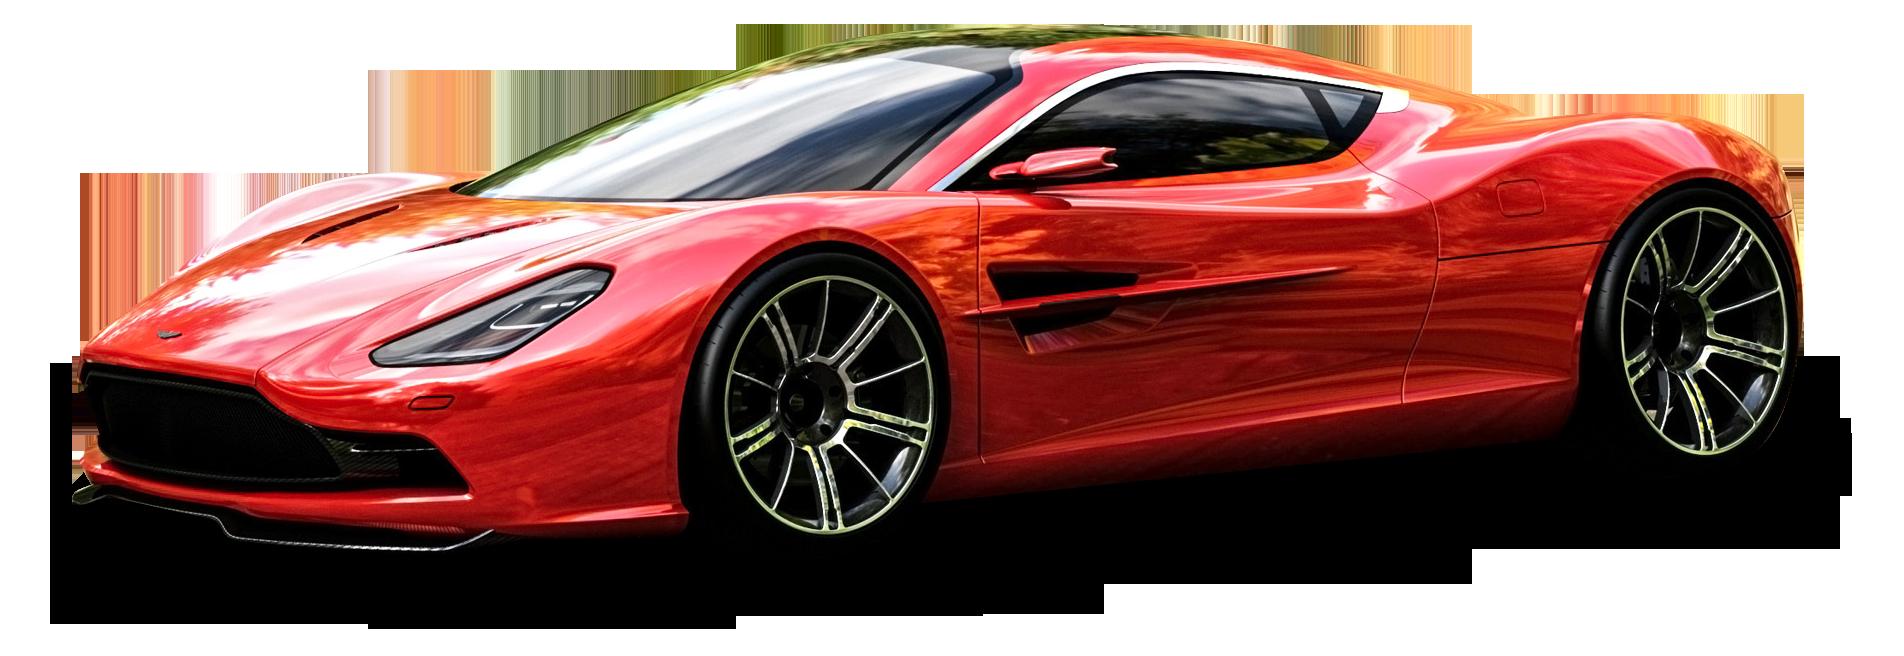 Red Aston Martin DBC Car